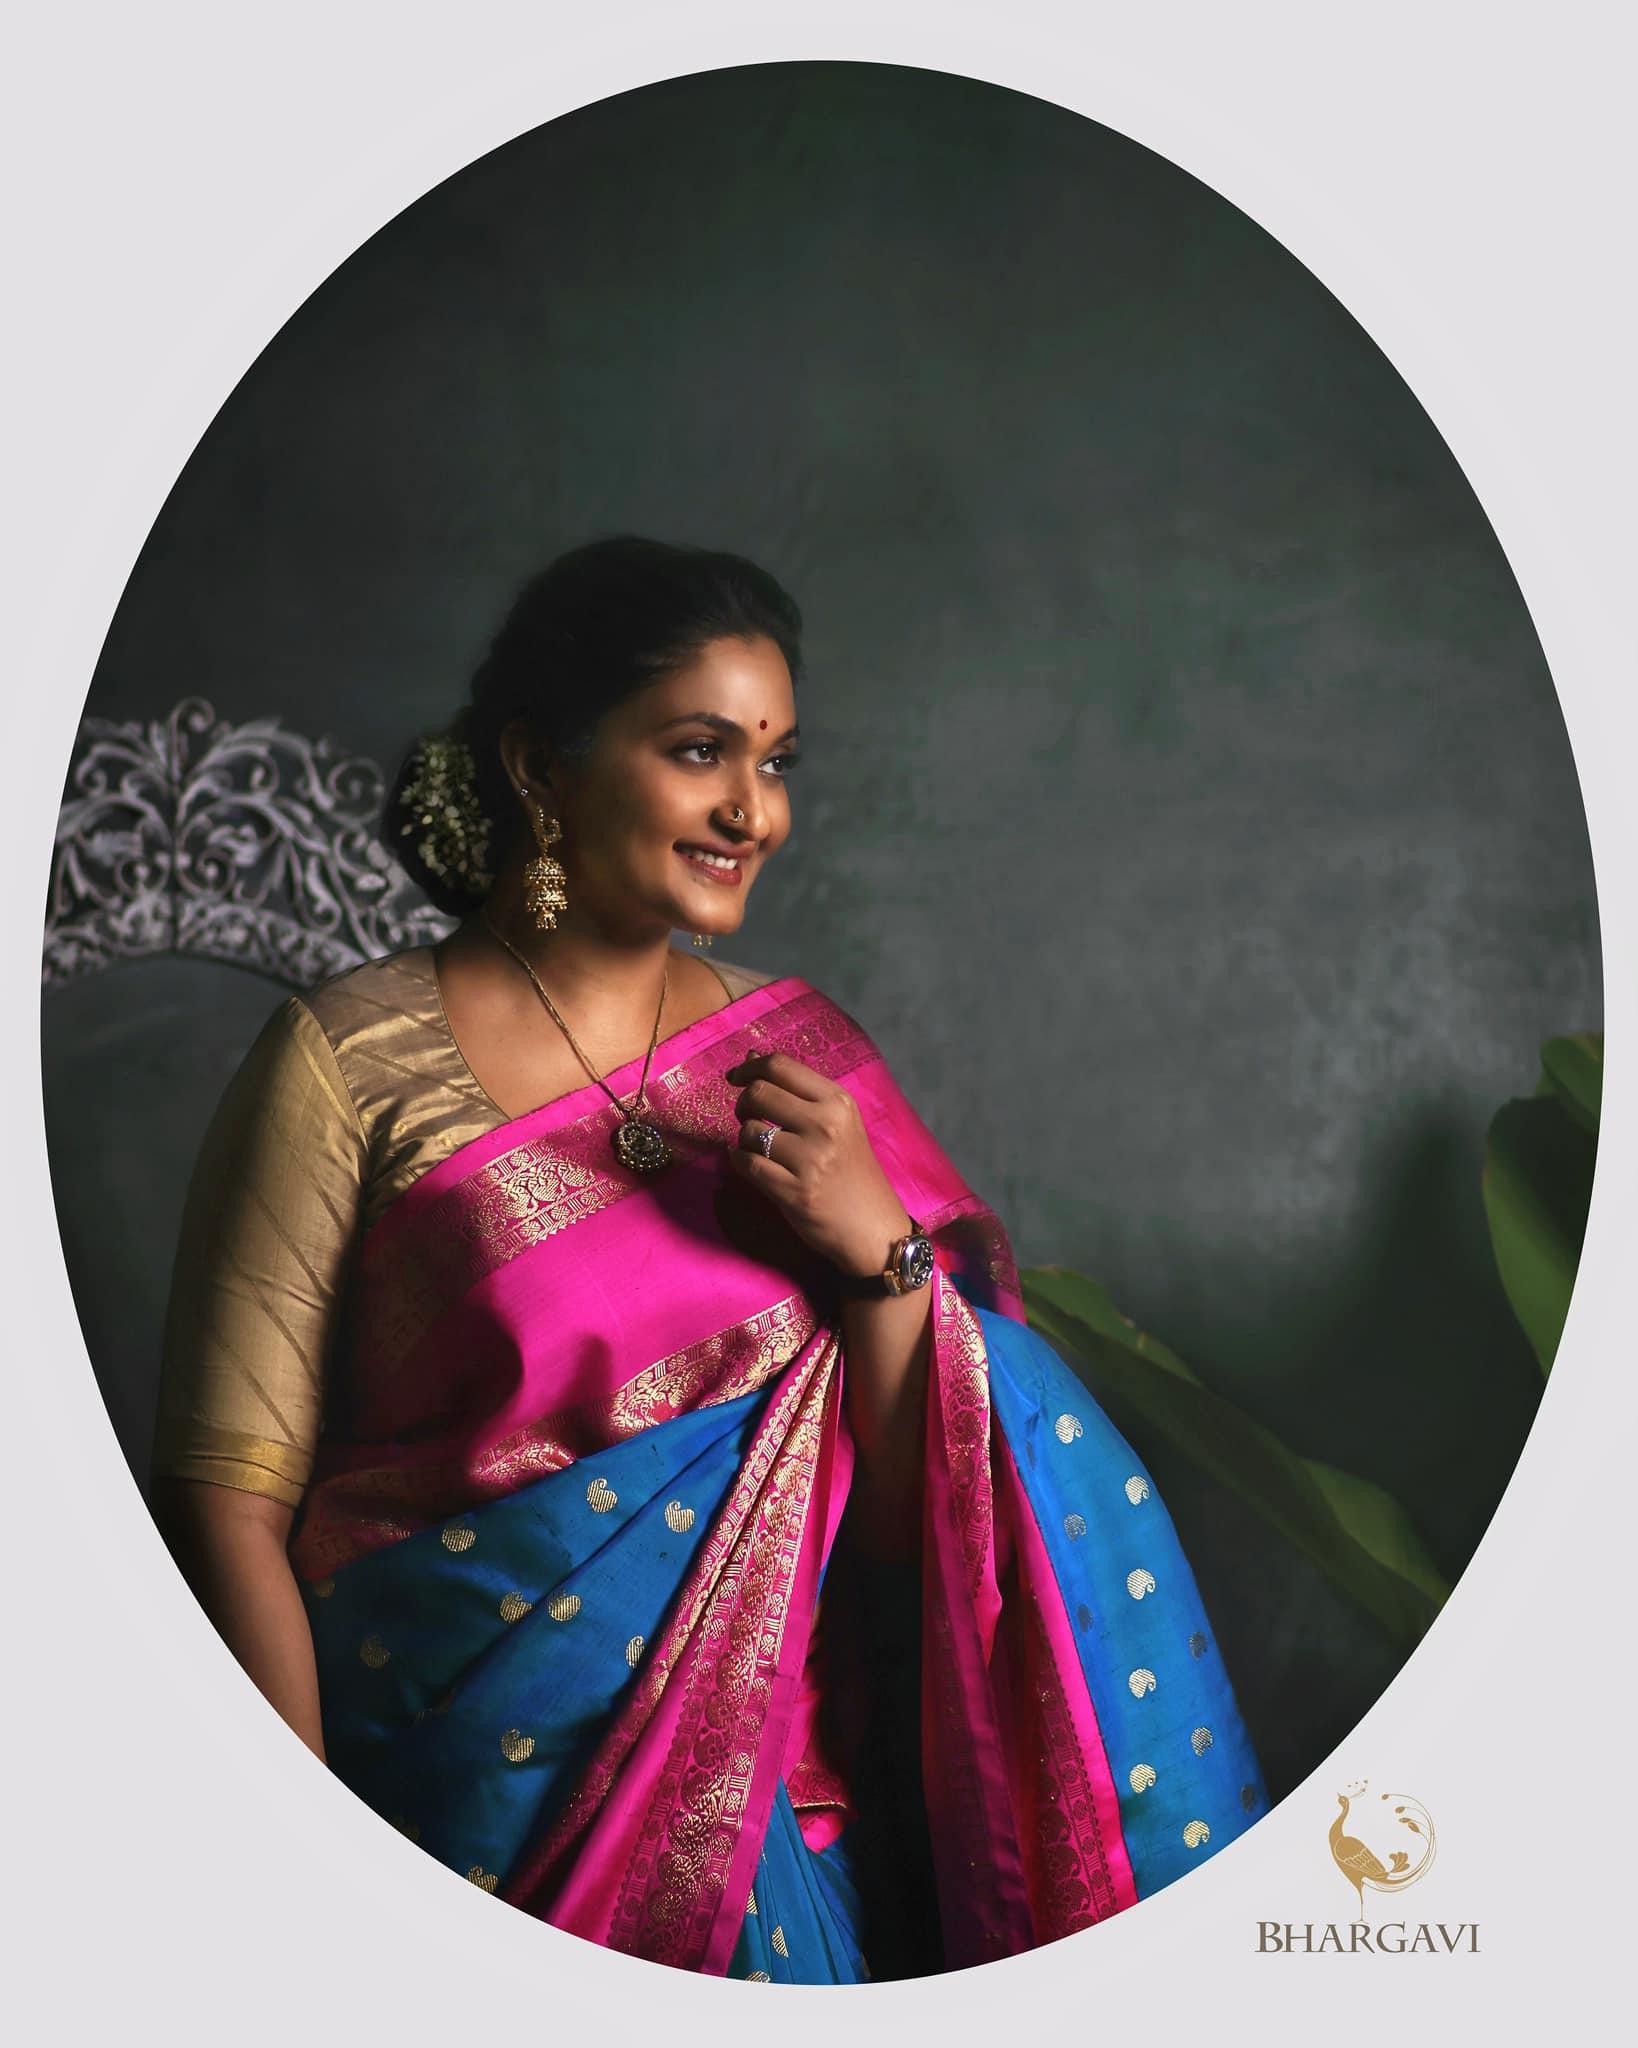 Beautiful designer Bhargavi Kunam in powder blue and pink color combination kanjeevaram saree.   2021-09-21